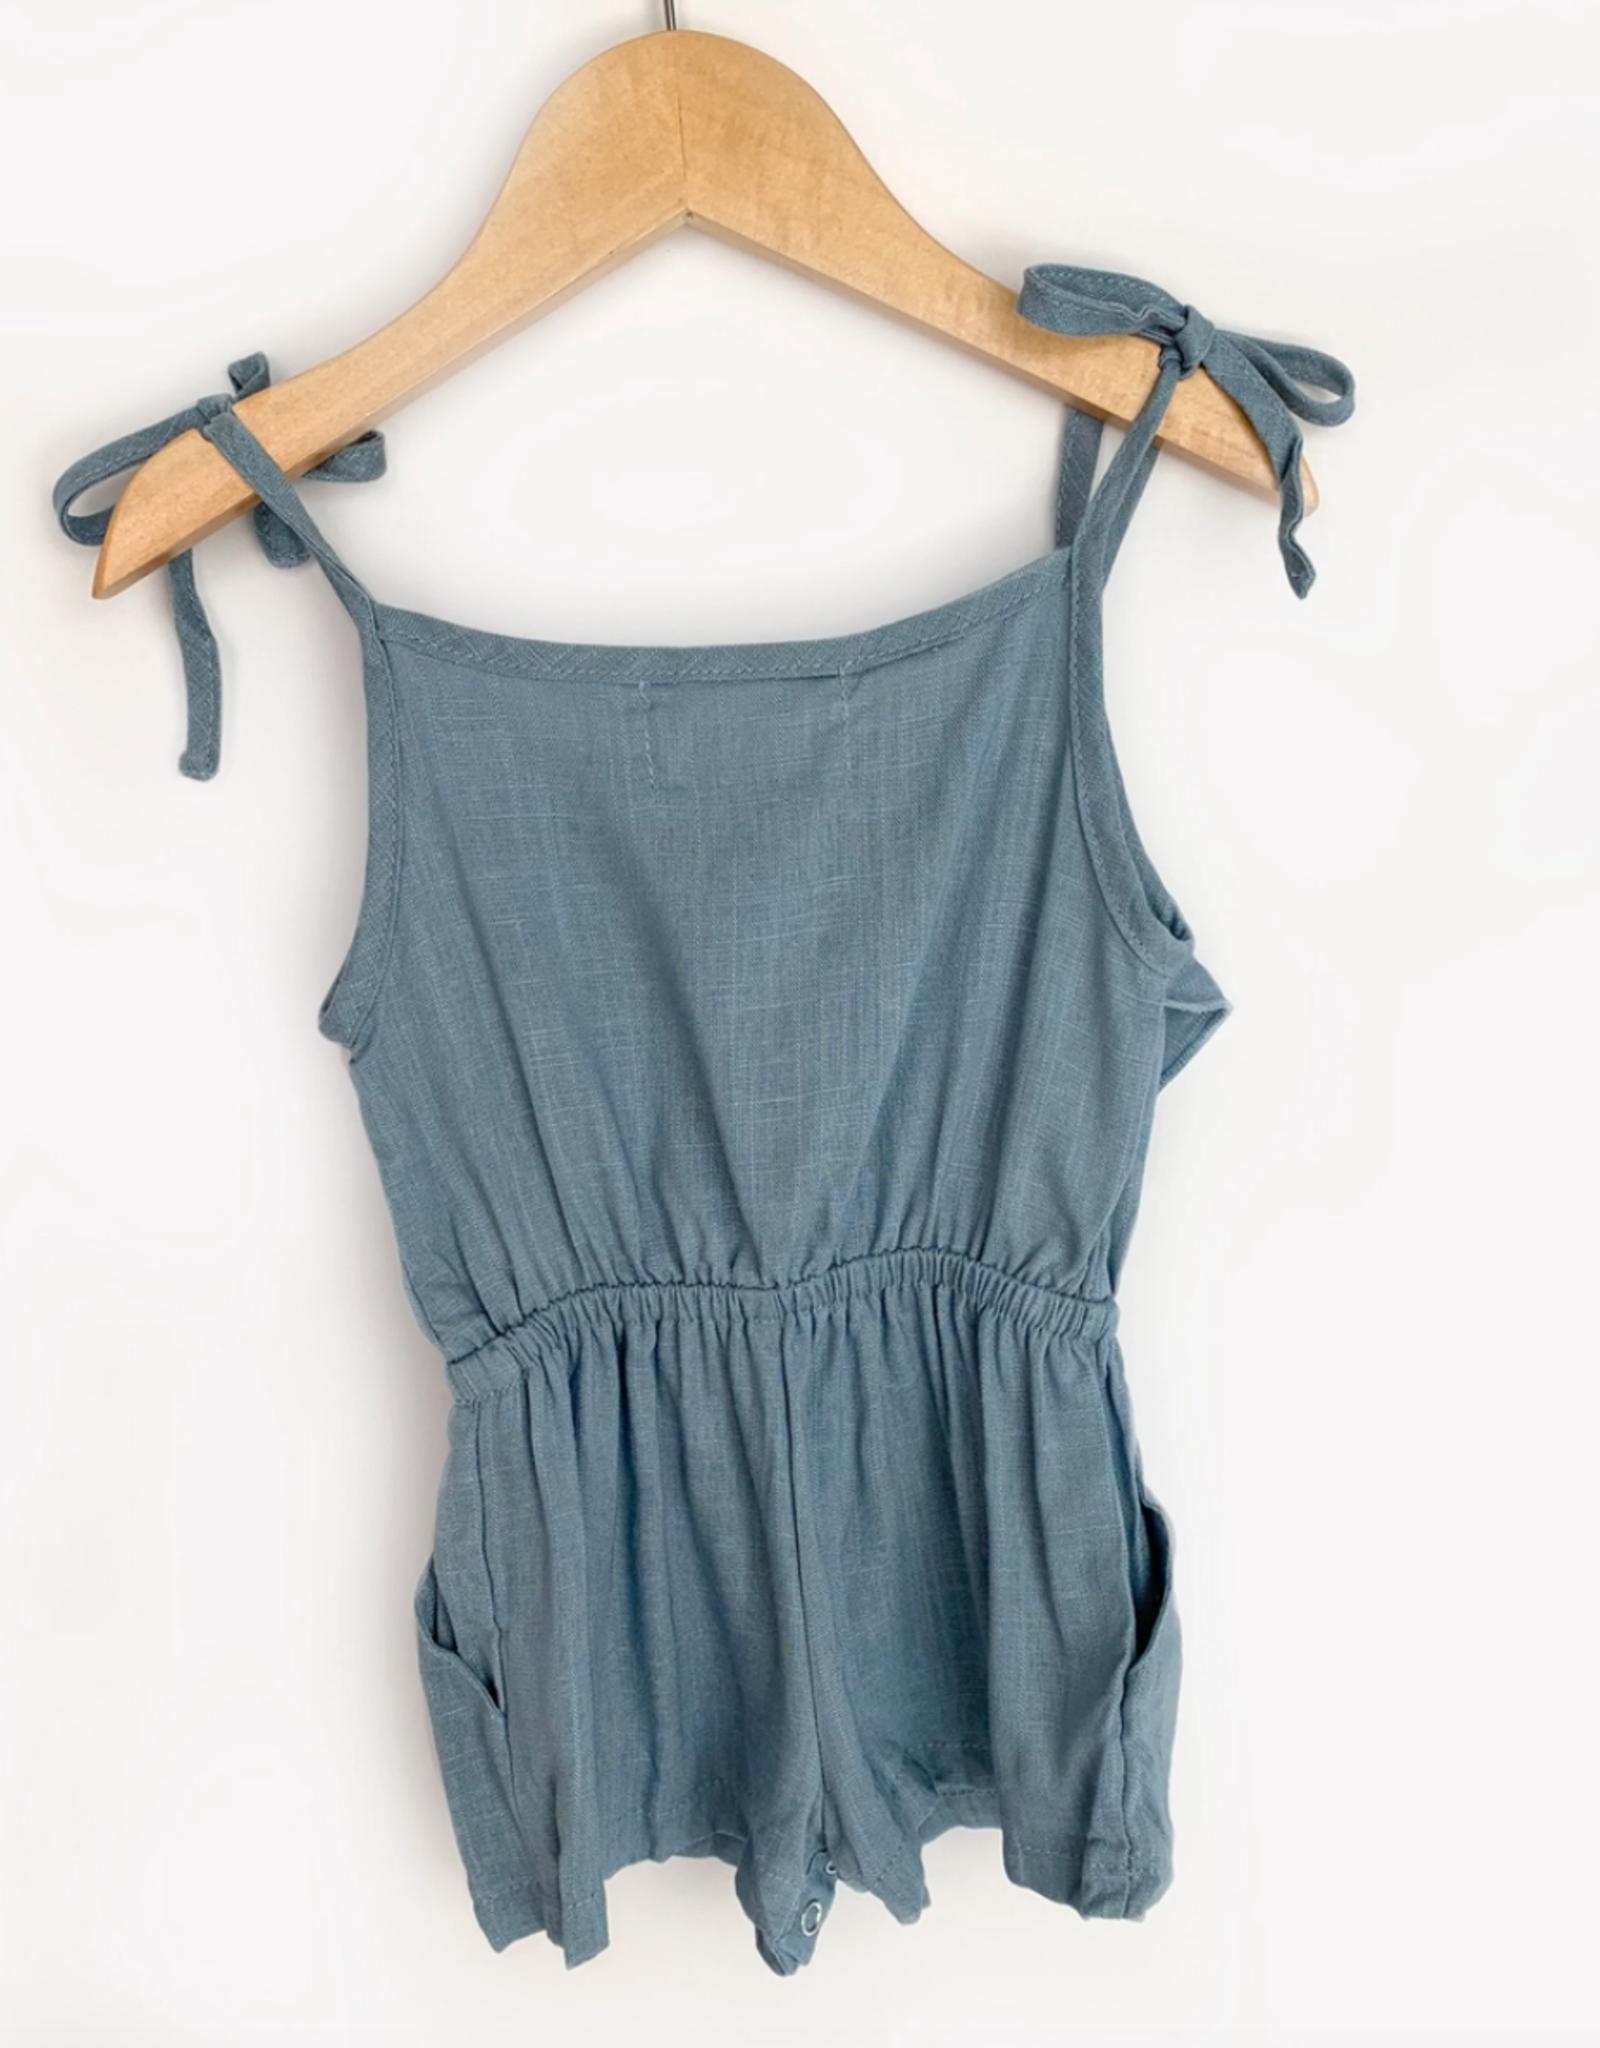 Carken Design Medium Blue Linen Tie Romper